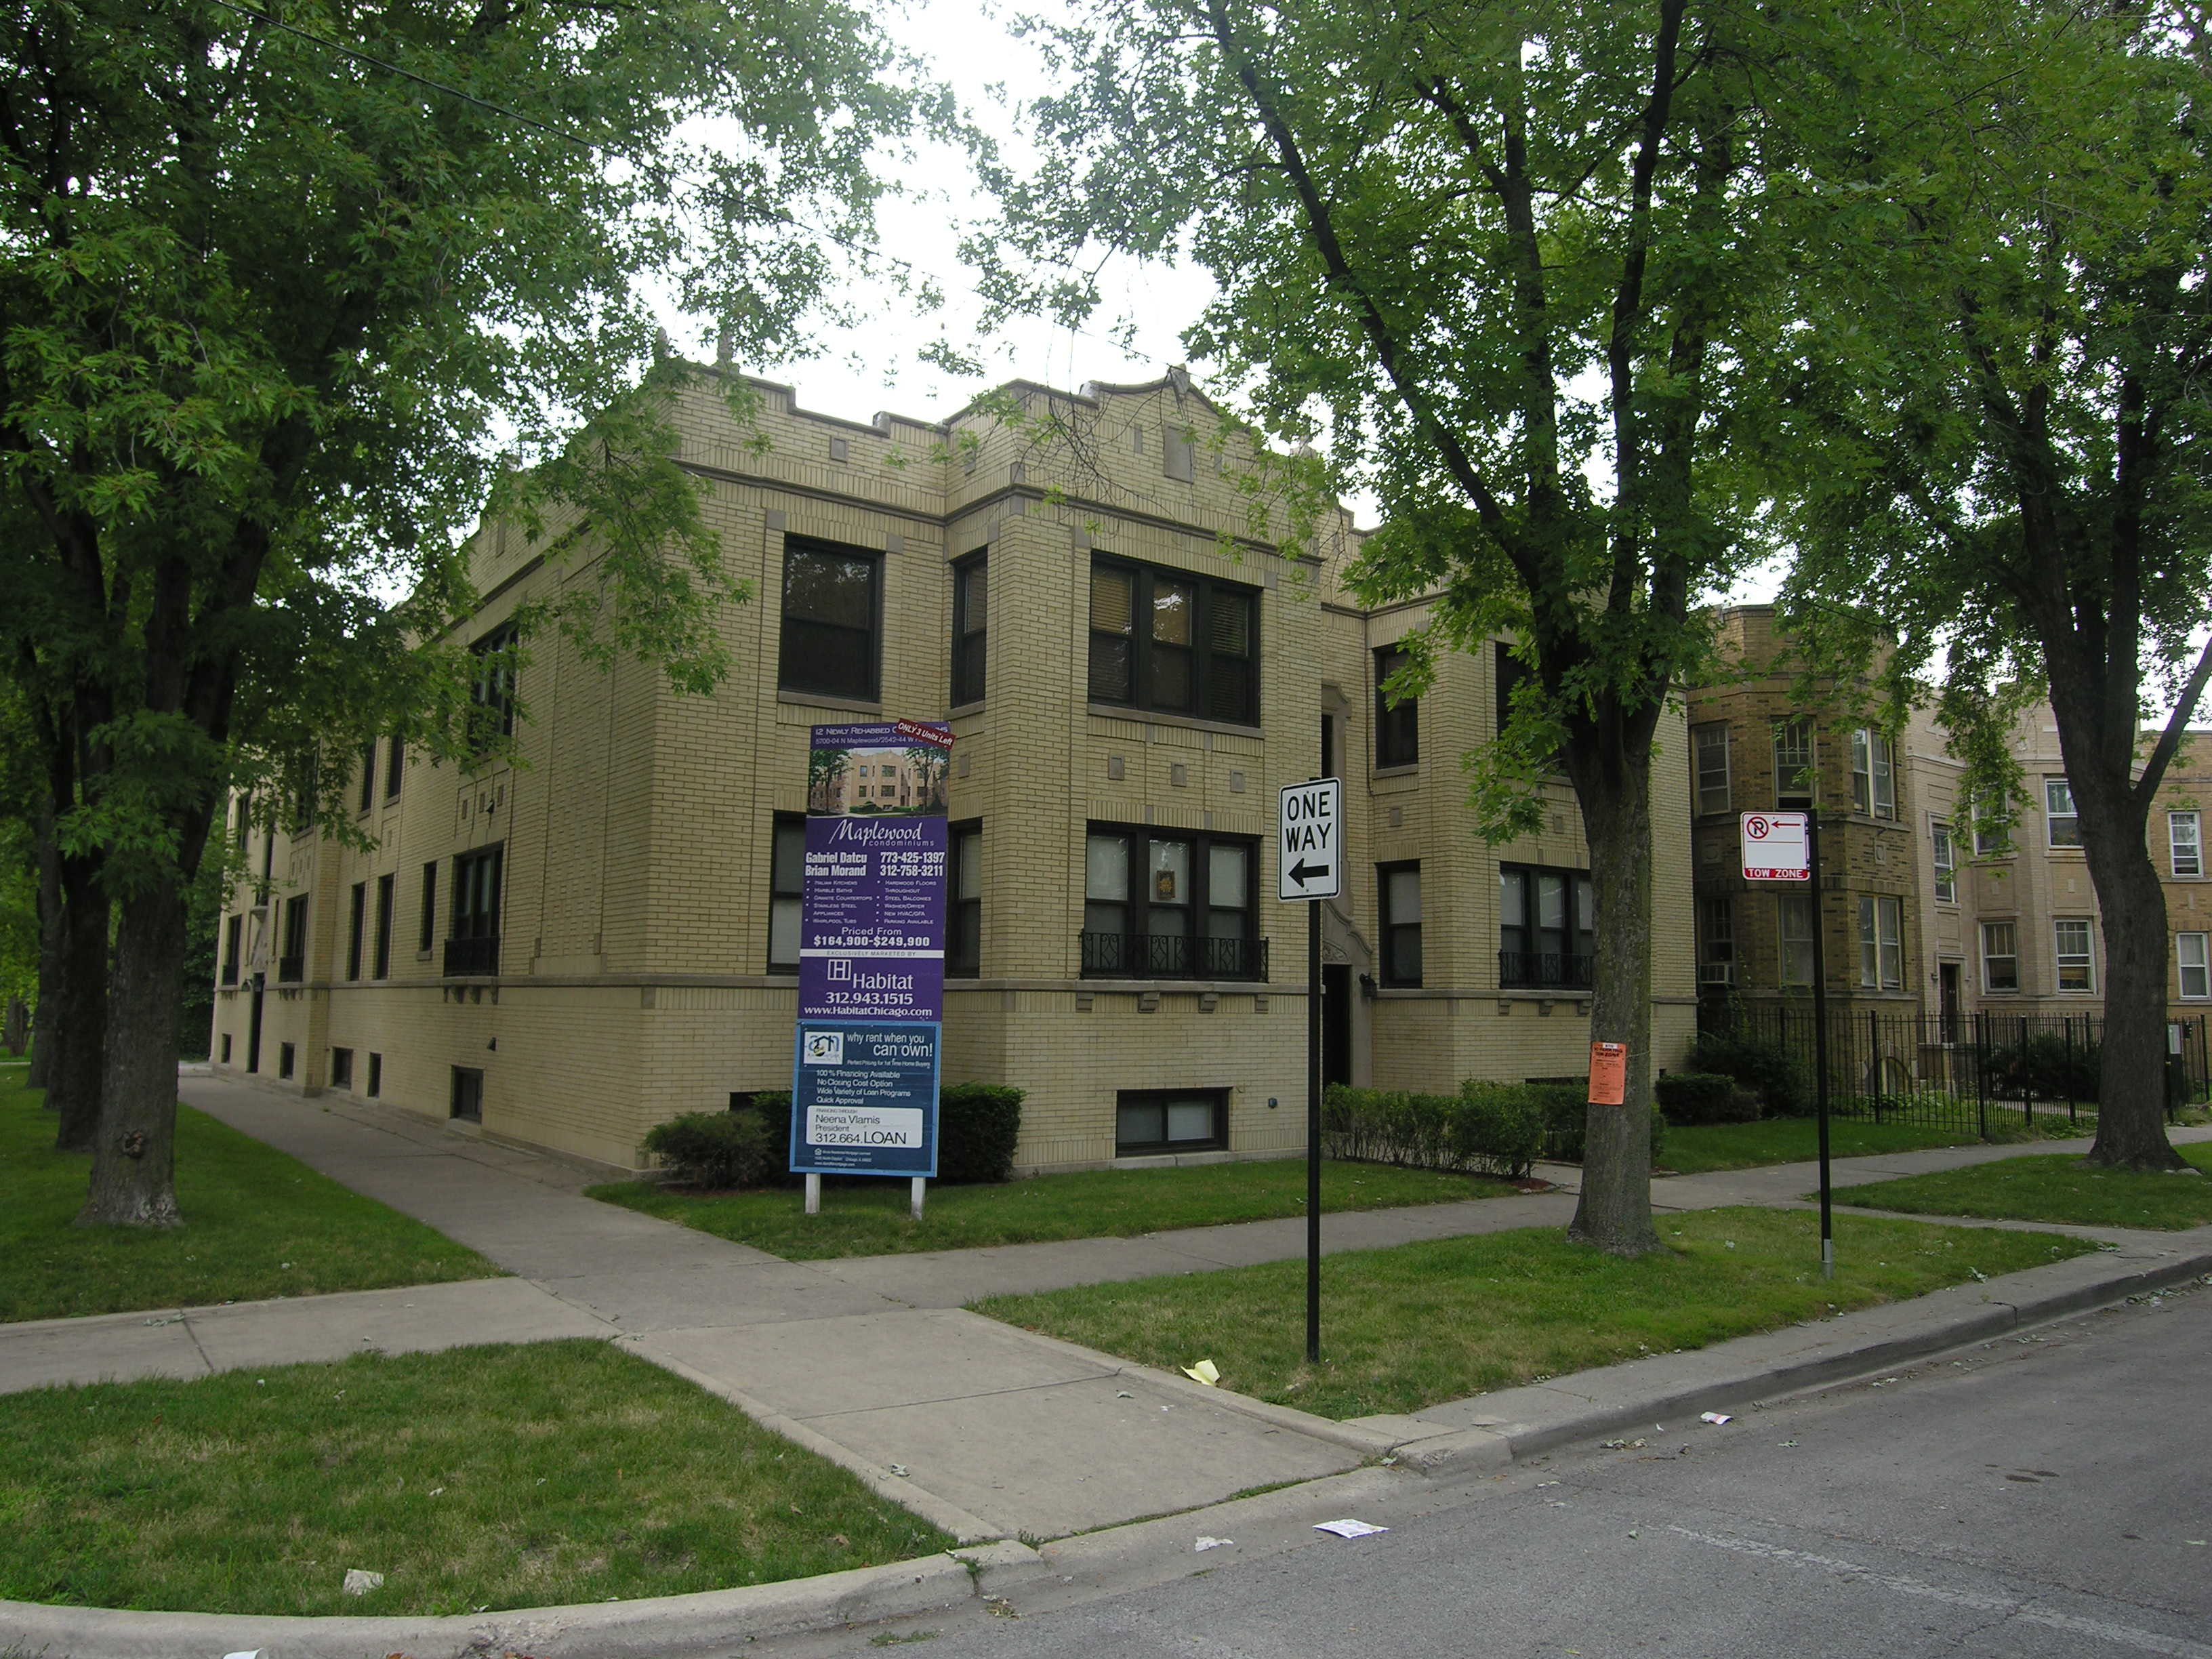 Maplewood Condominiums – a slice of Arcadia on the Northwest Side